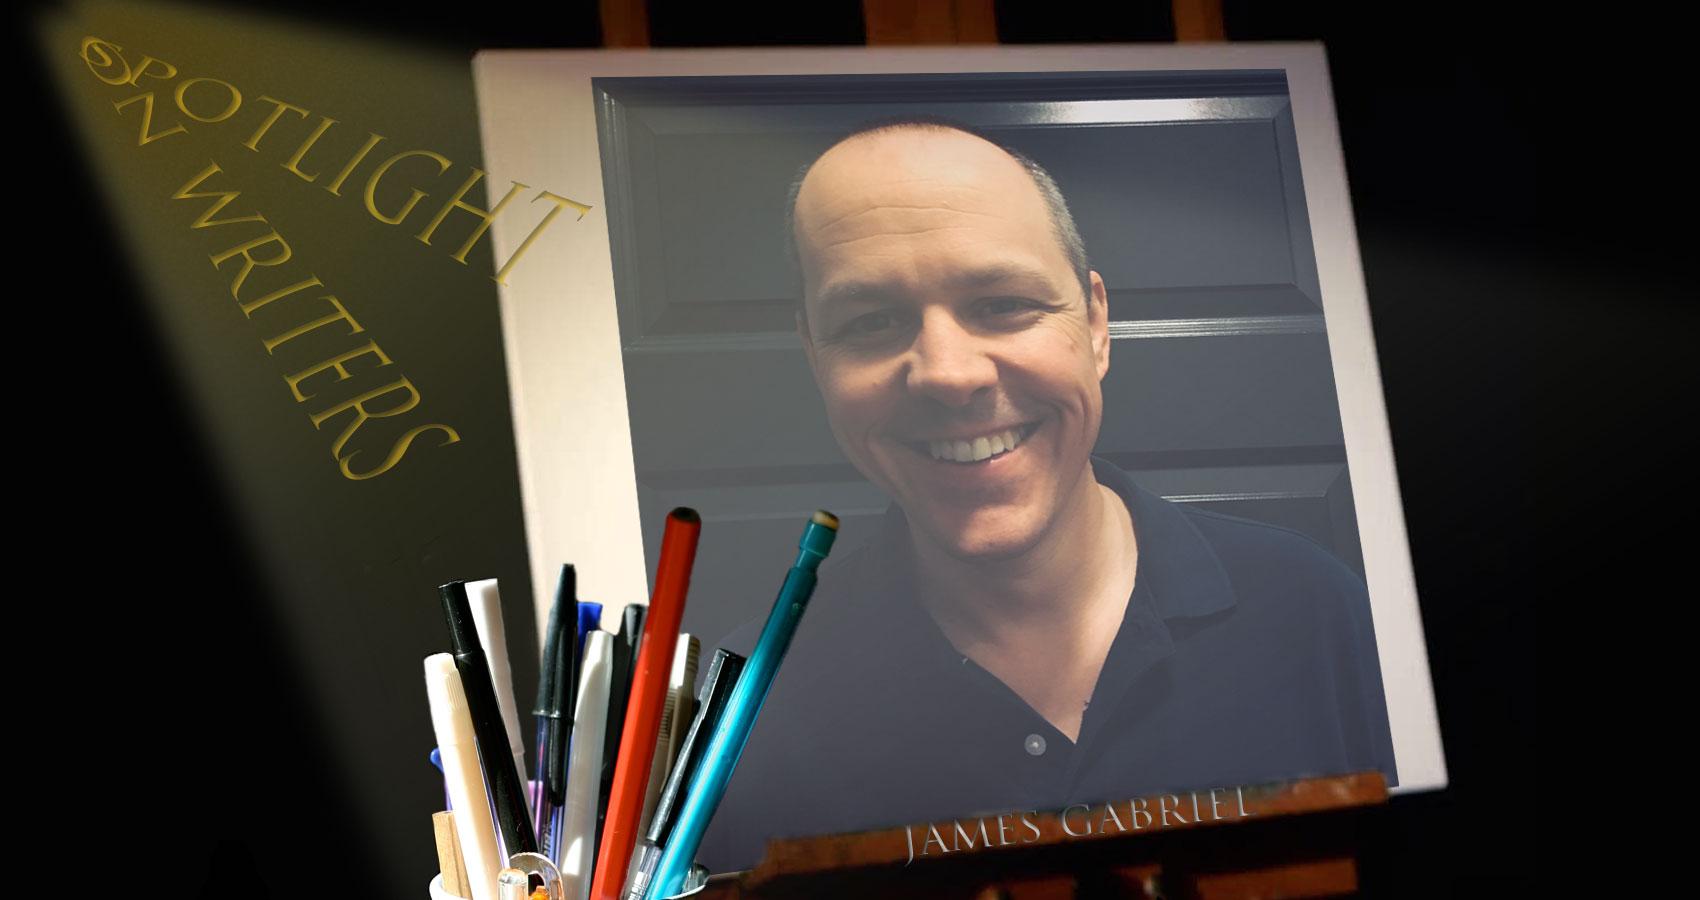 Spotlight On Writers - James Gabriel at Spillwords.com